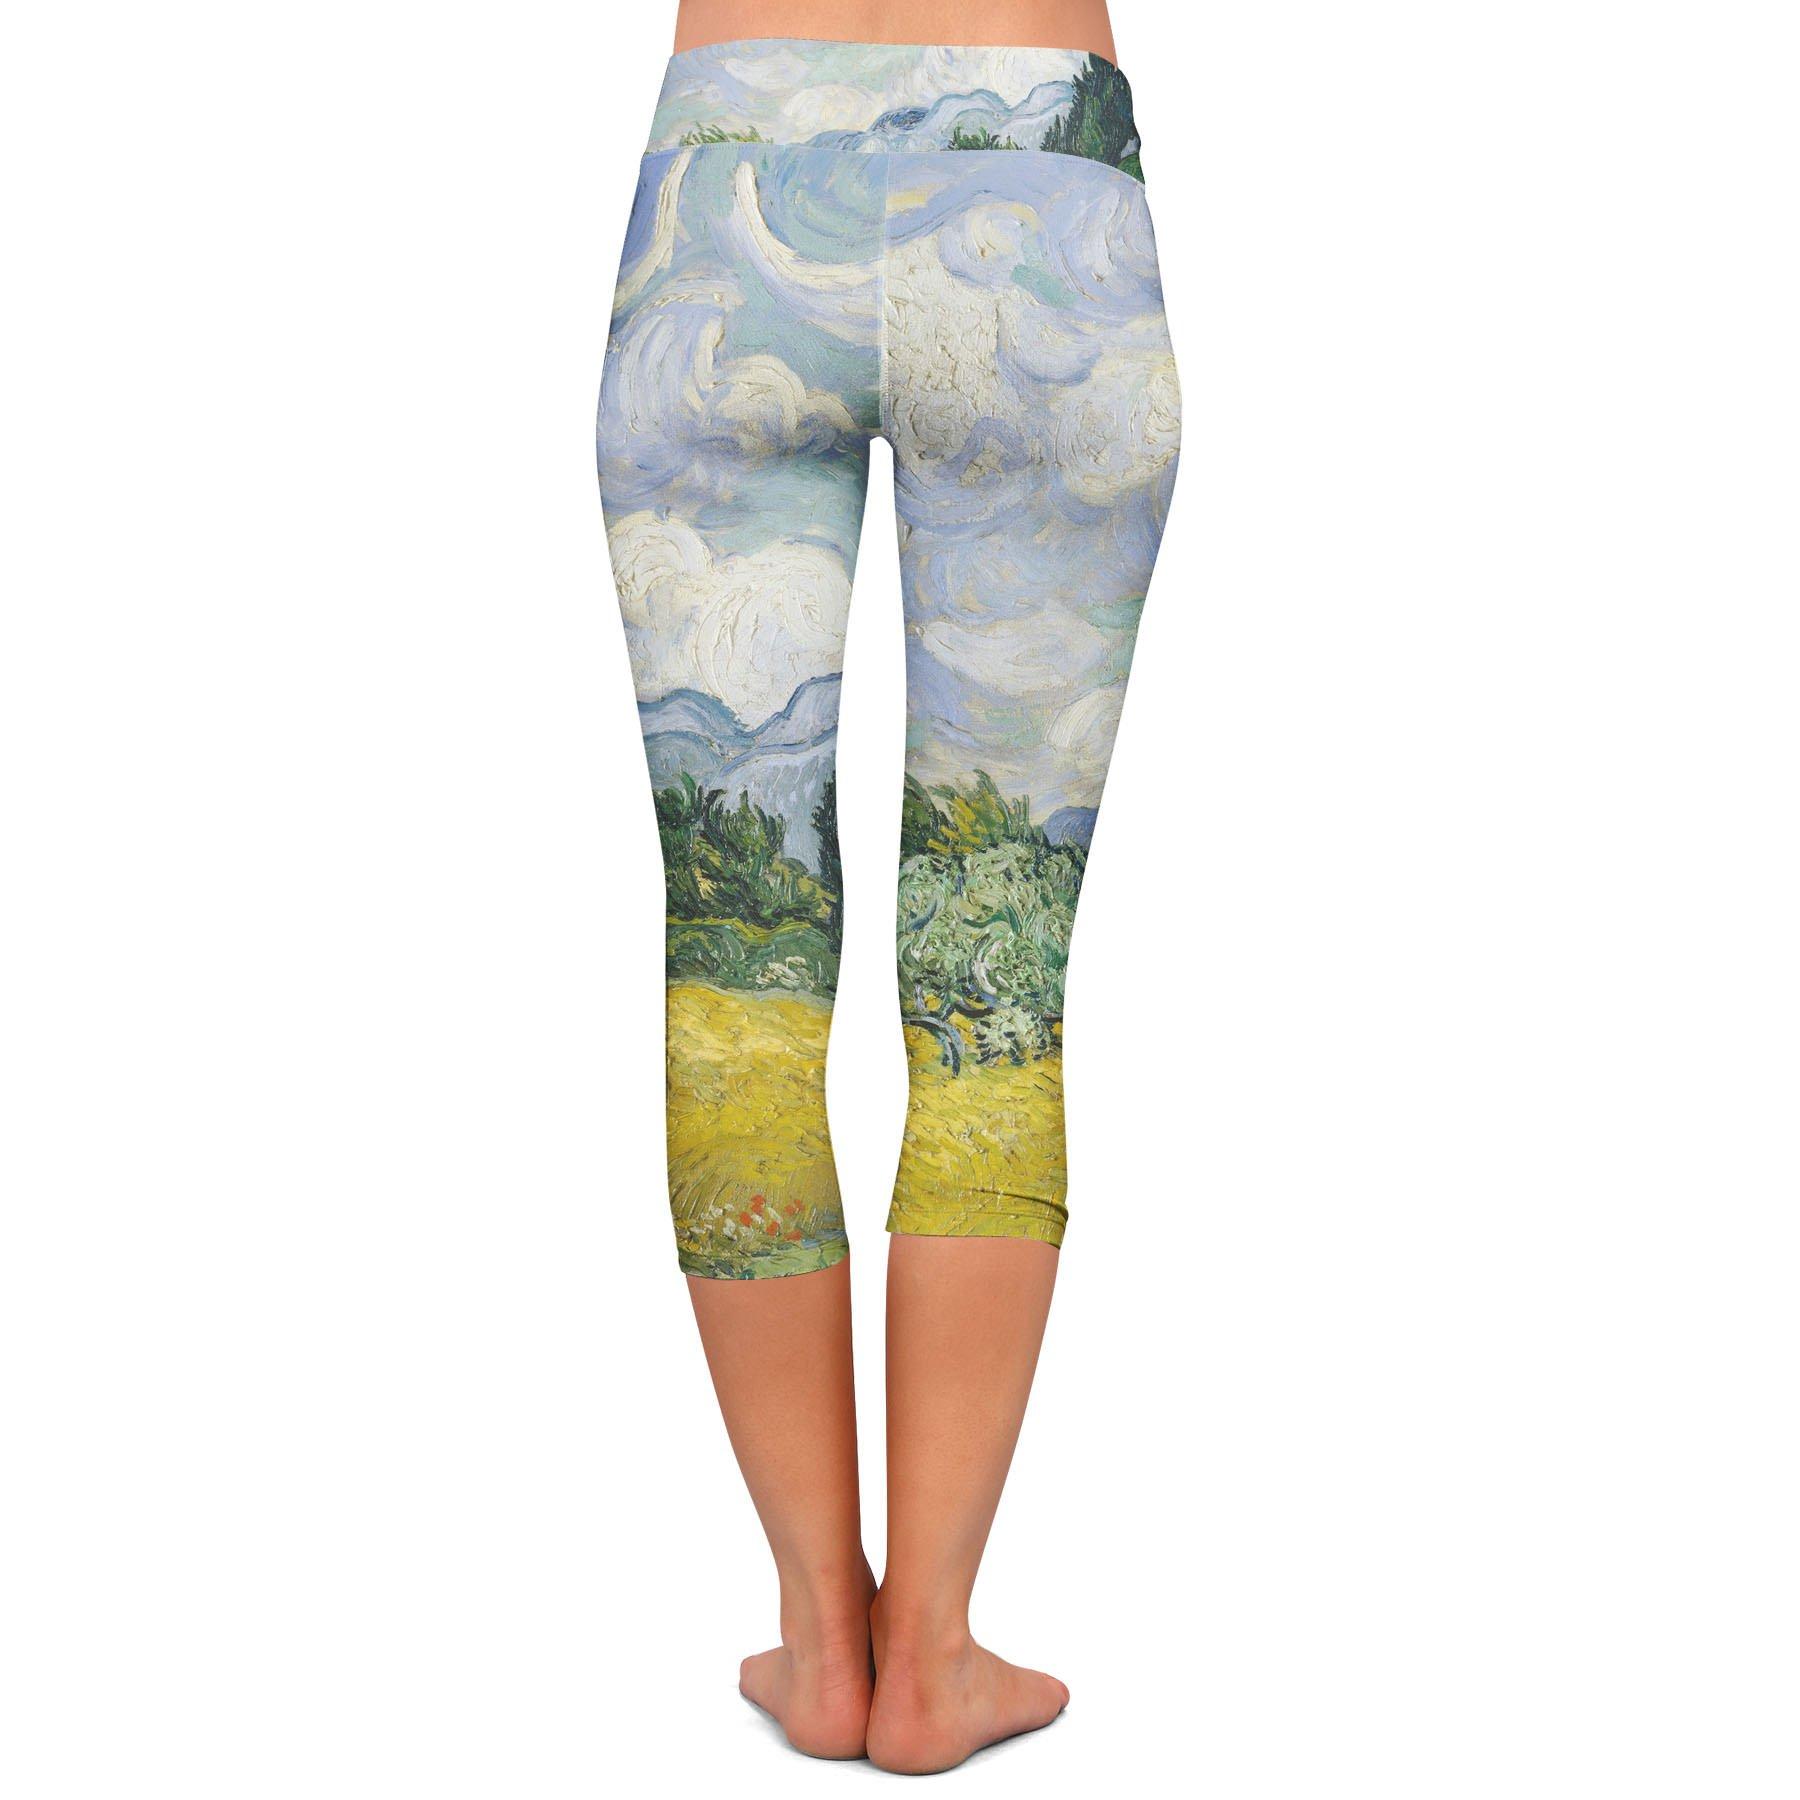 Vincent Van Gogh Fine Art Painting Yoga Leggings - Capri 3/4 Length, Low Waist by Queen of Cases (Image #3)